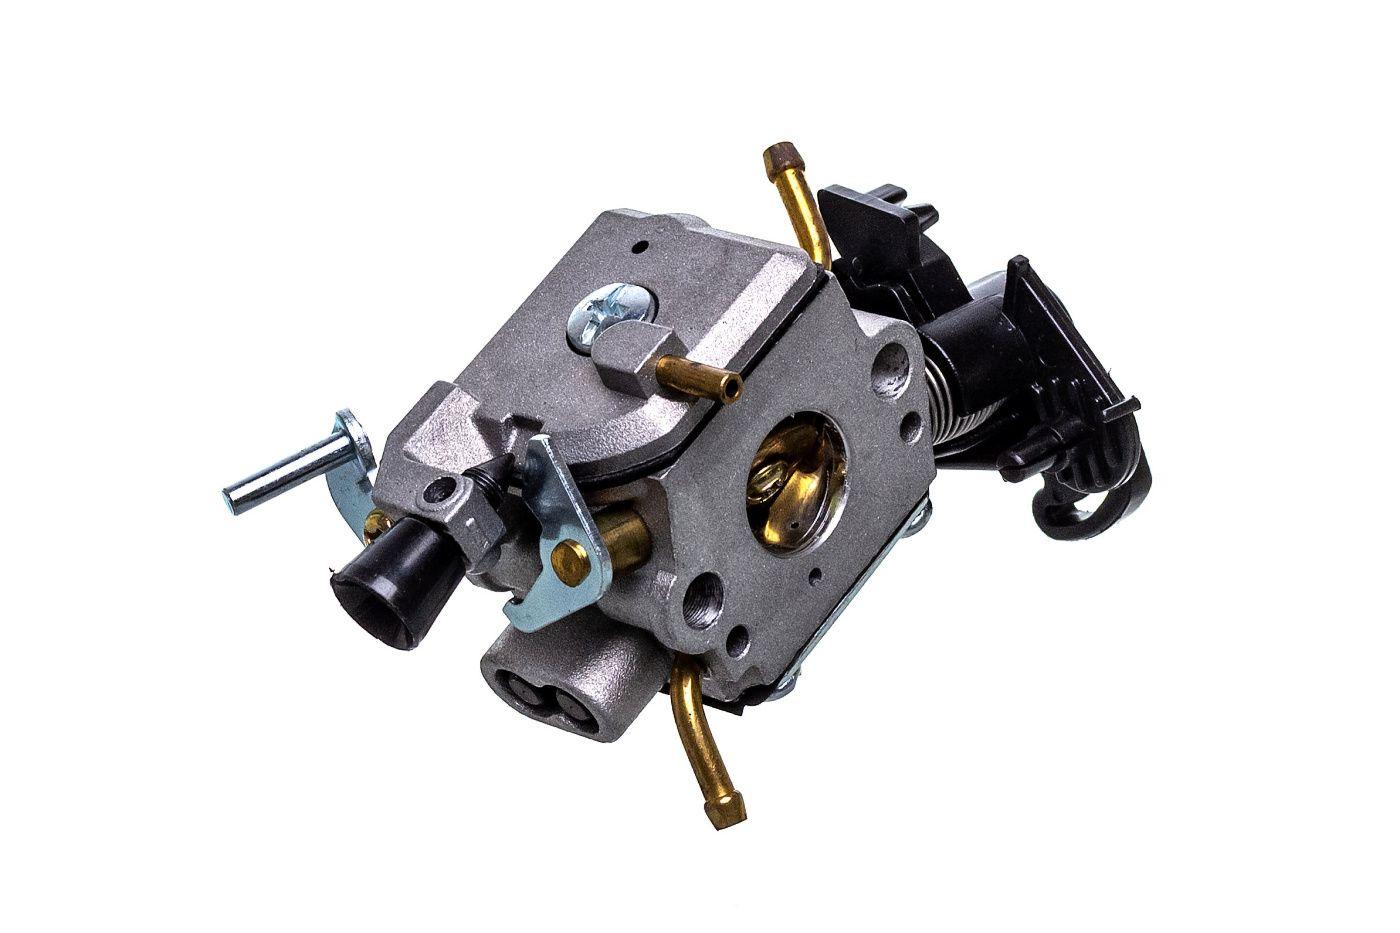 Karburátor Husqvarna 445, 450 Jonsered  CS2245, CS2250 SUPER AKCE